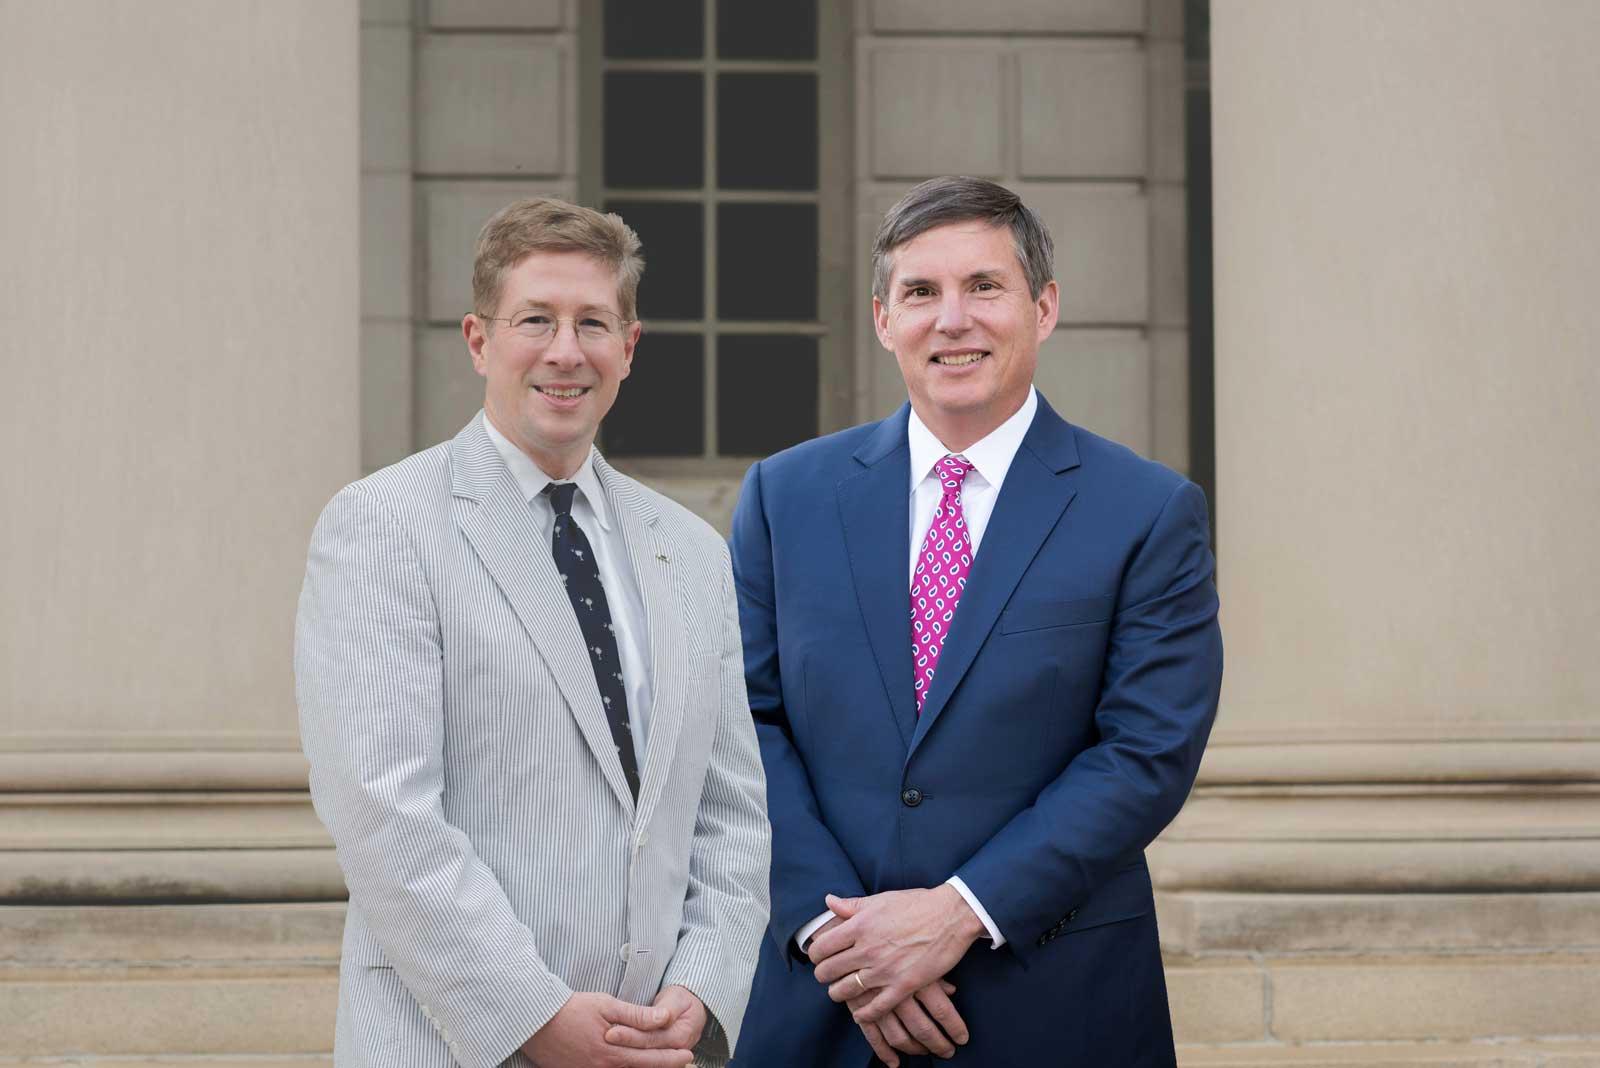 John Grantland & J.R. Murphy